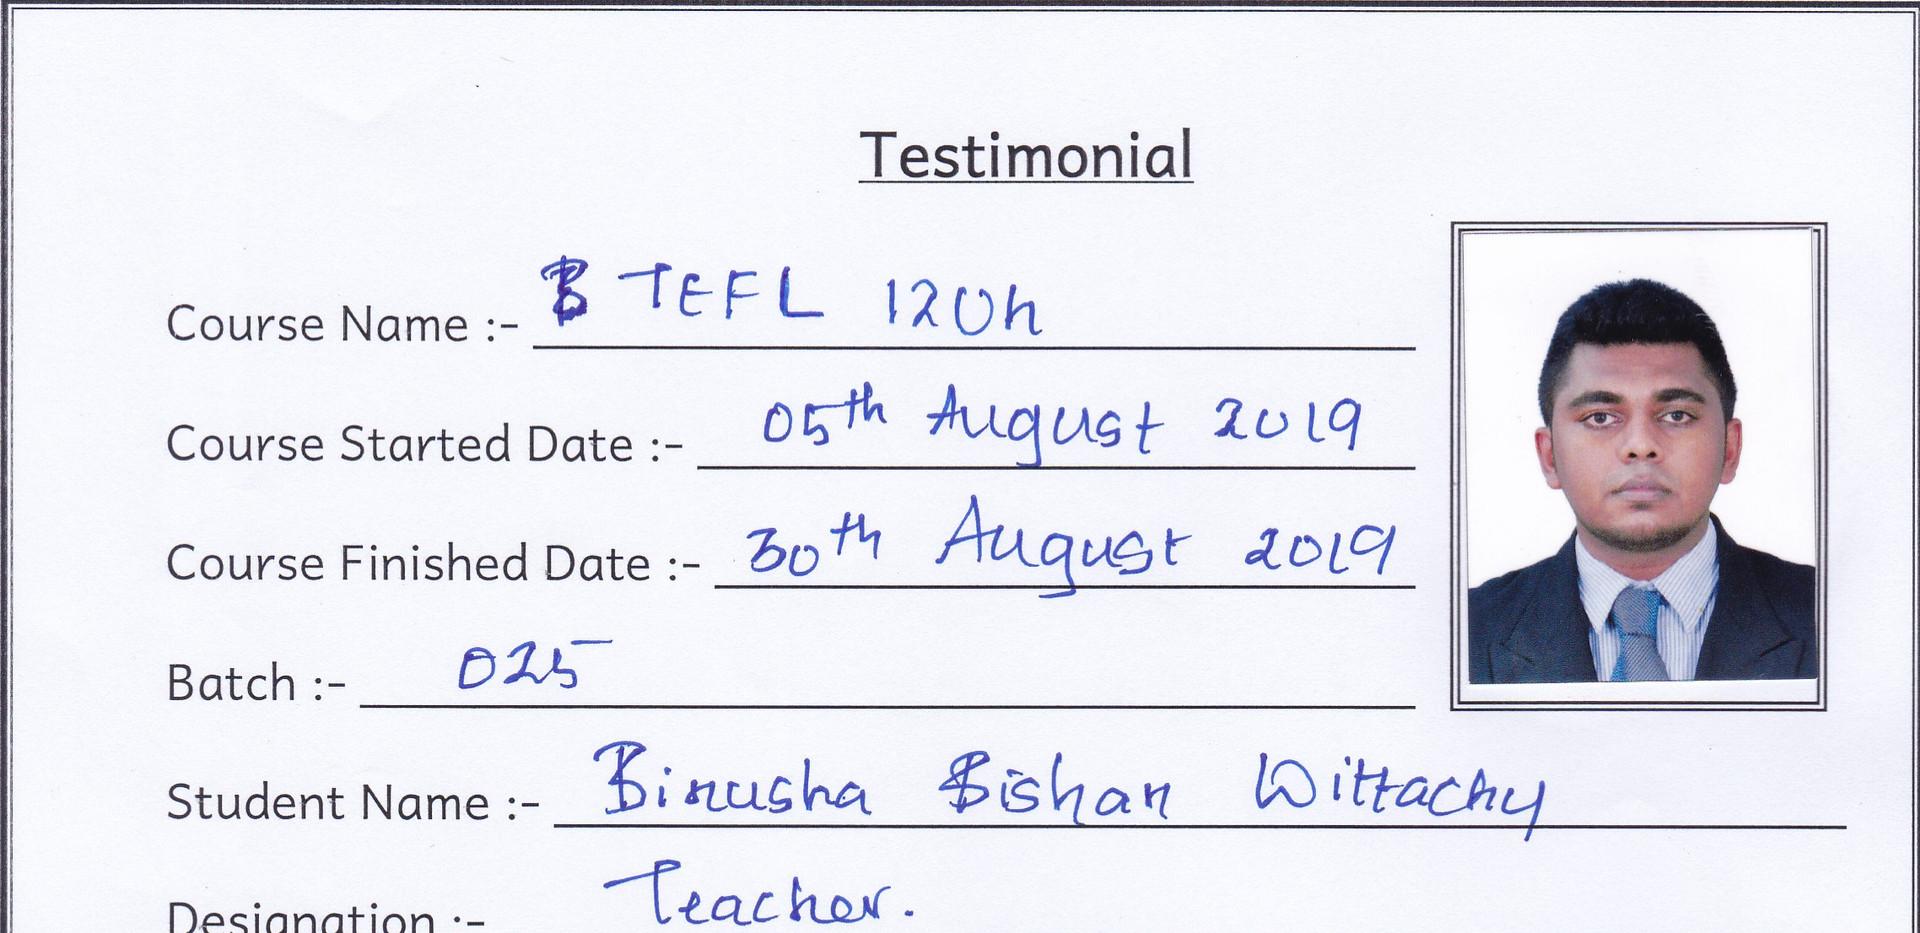 Bishan Binusha Wittachy - Batch 25.jpg